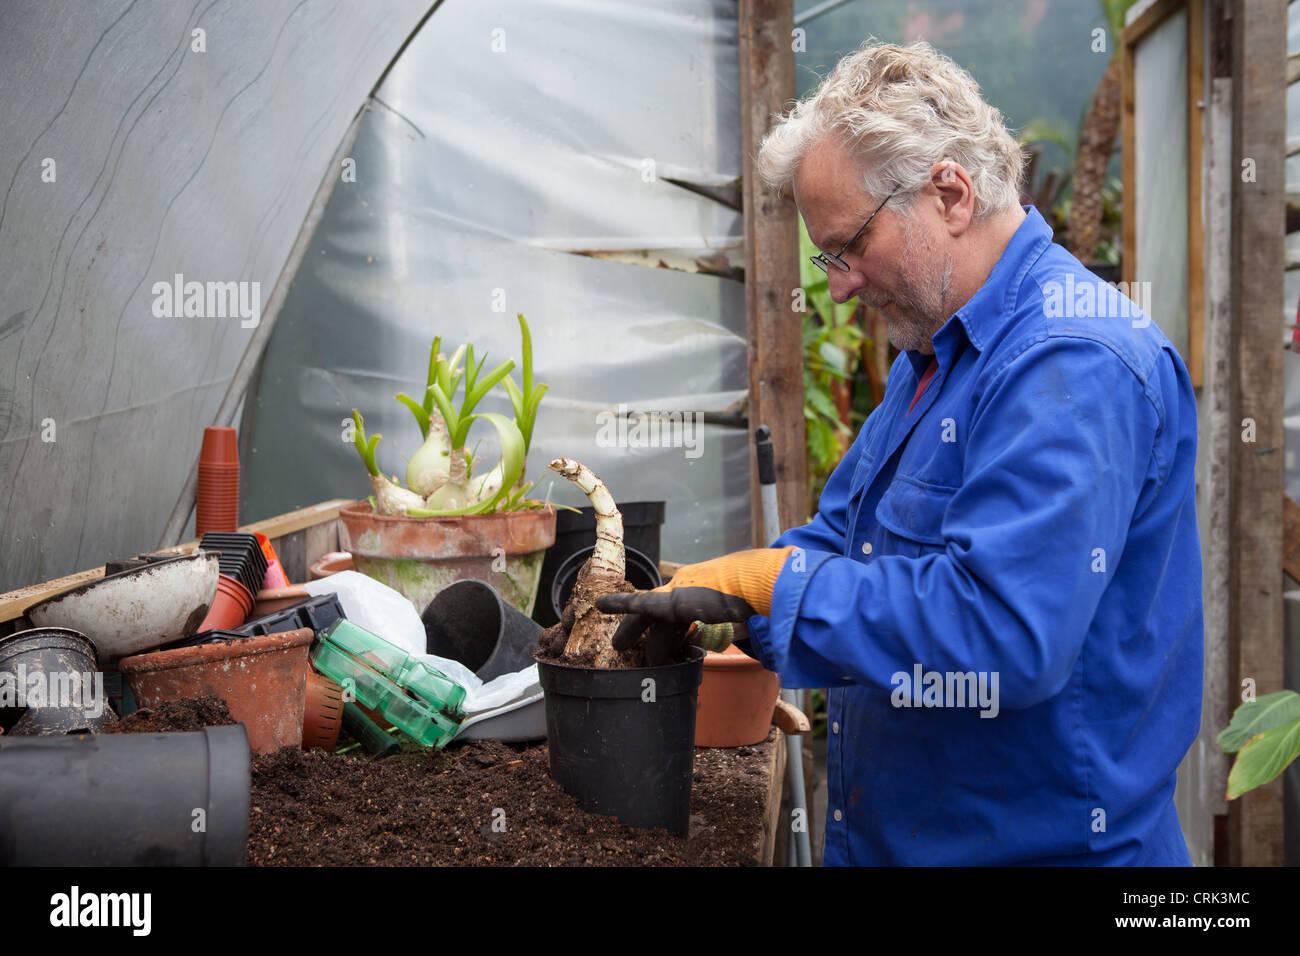 A gardener planting CRINUM powellii bulbs in a black plastic plant pot Stock Photo